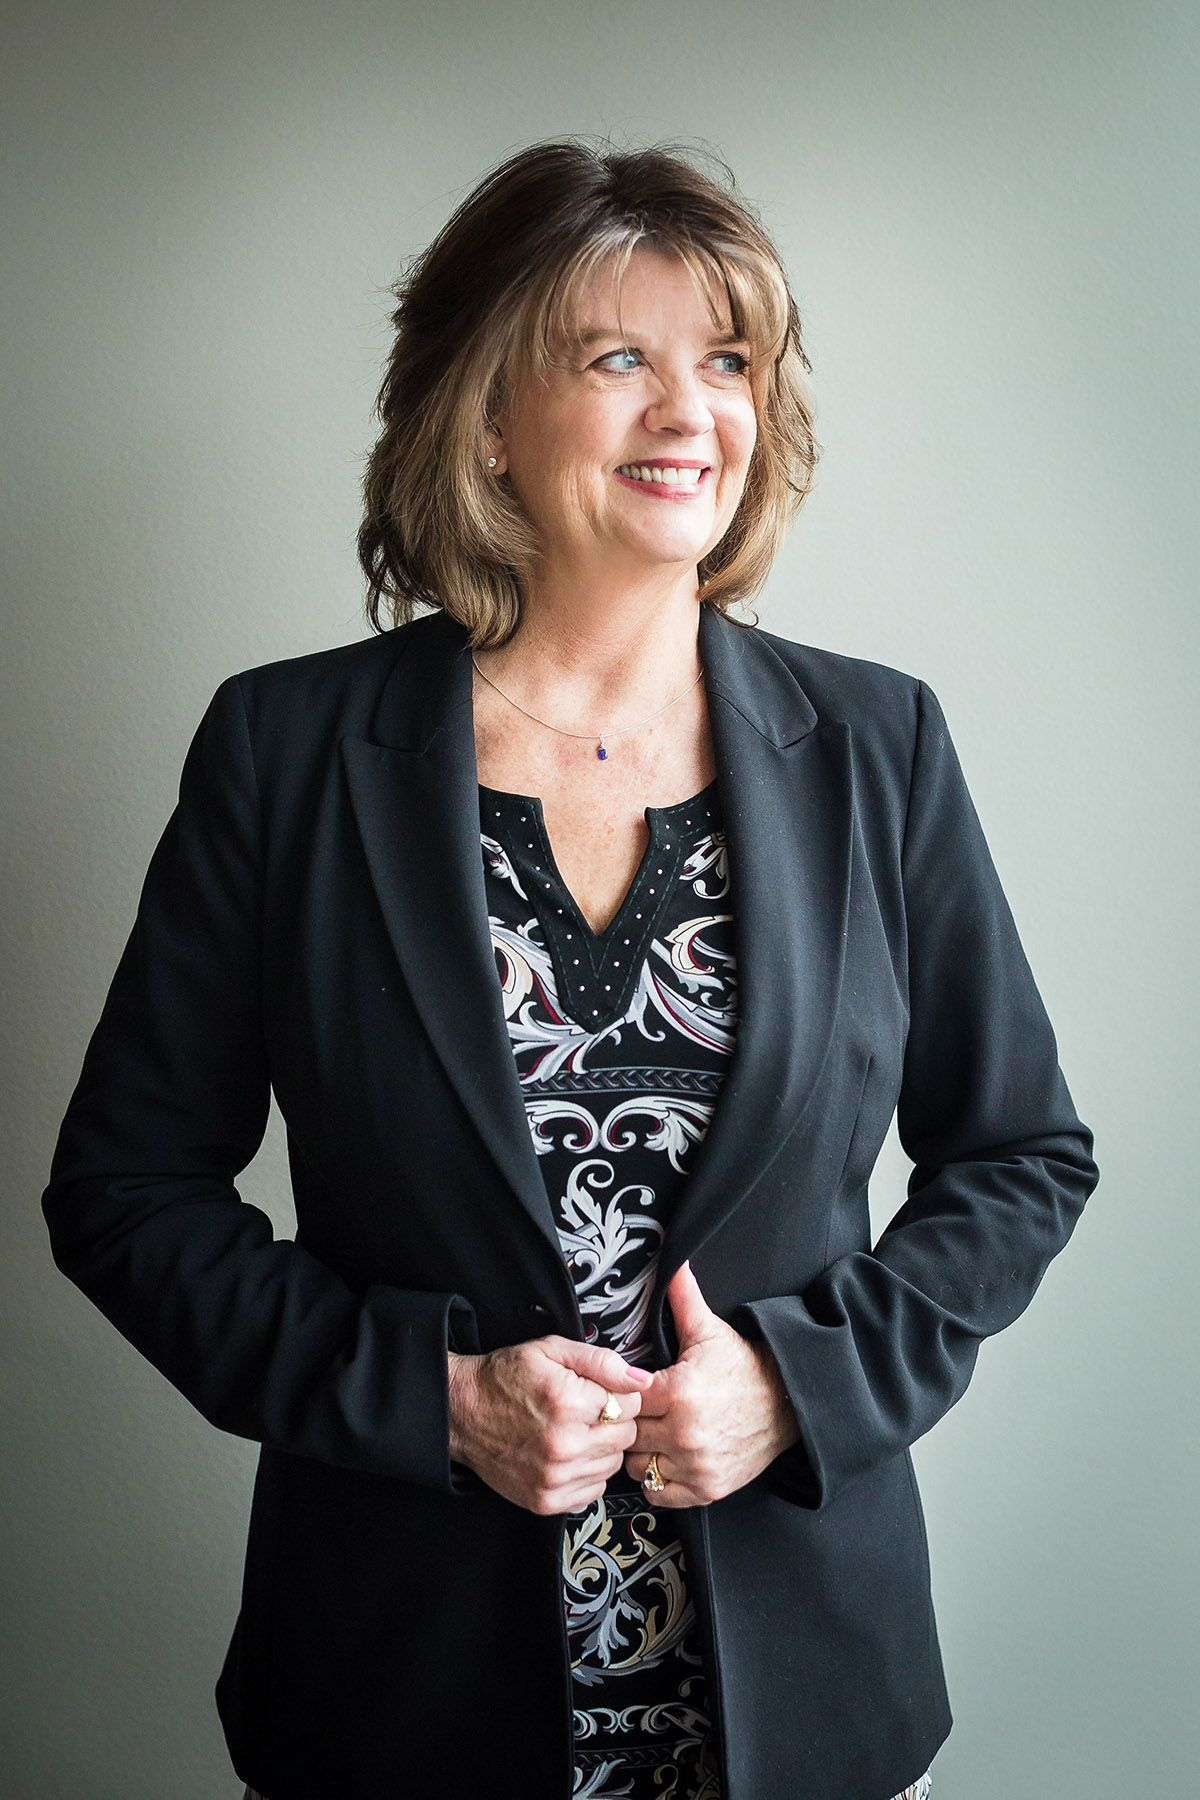 Cindy Waller